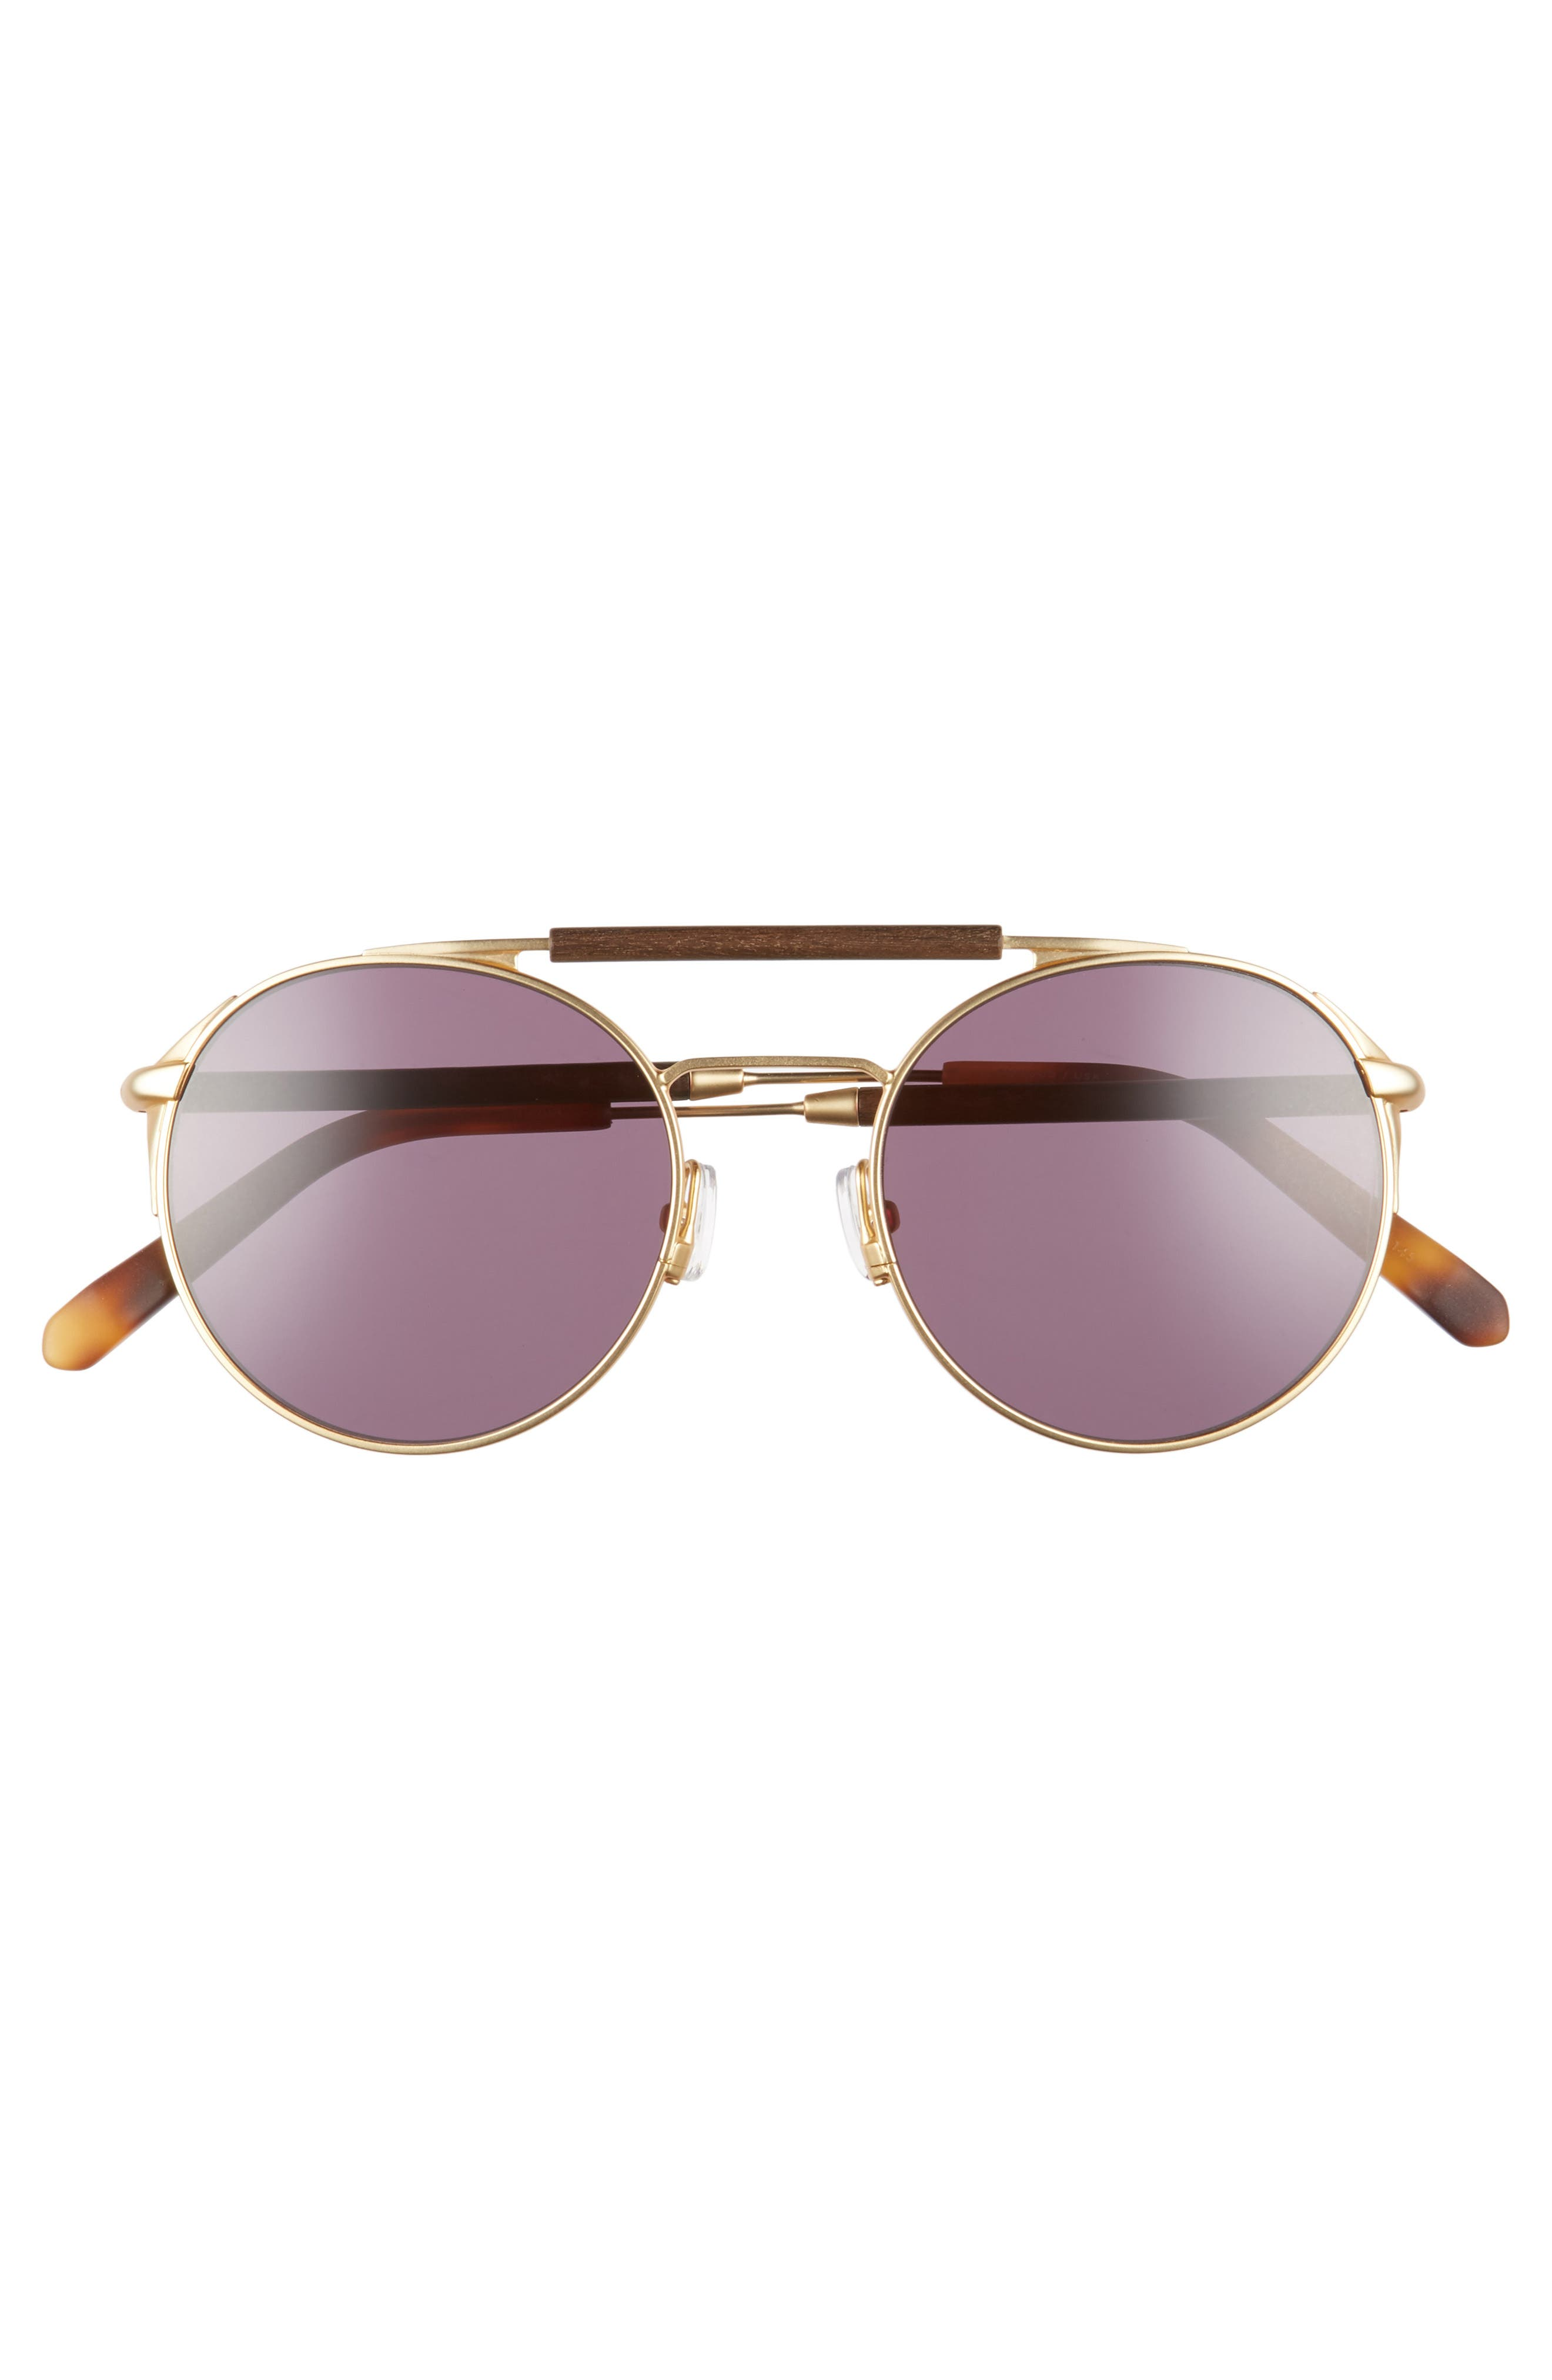 Bandon 52mm Round Sunglasses,                             Alternate thumbnail 2, color,                             Matte Gold/ Walnut/ Grey